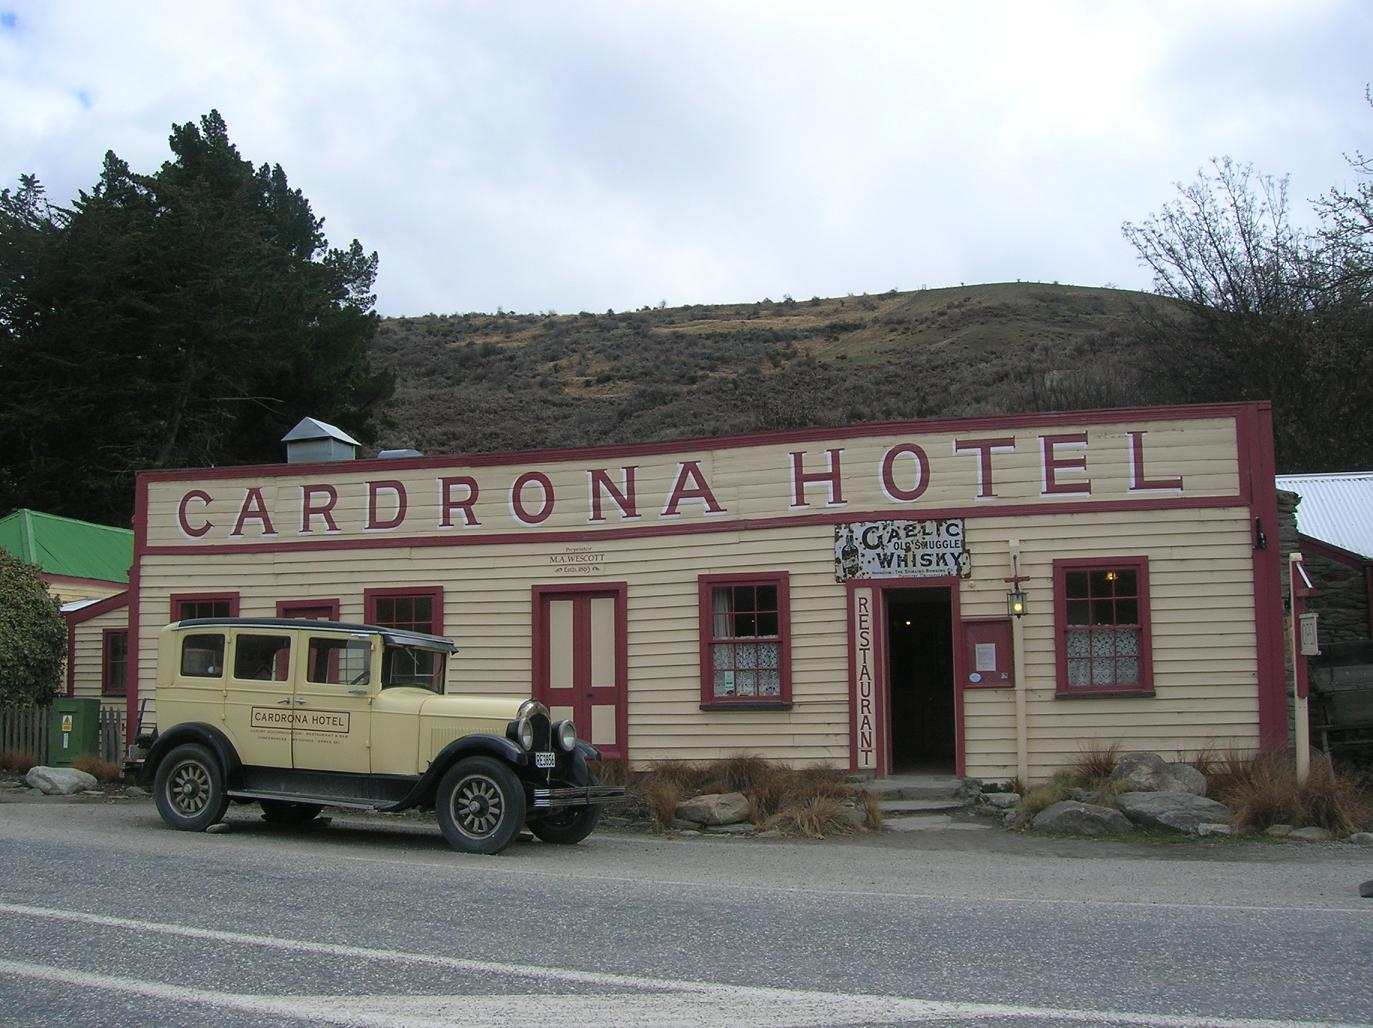 Das Cardrona Hotel